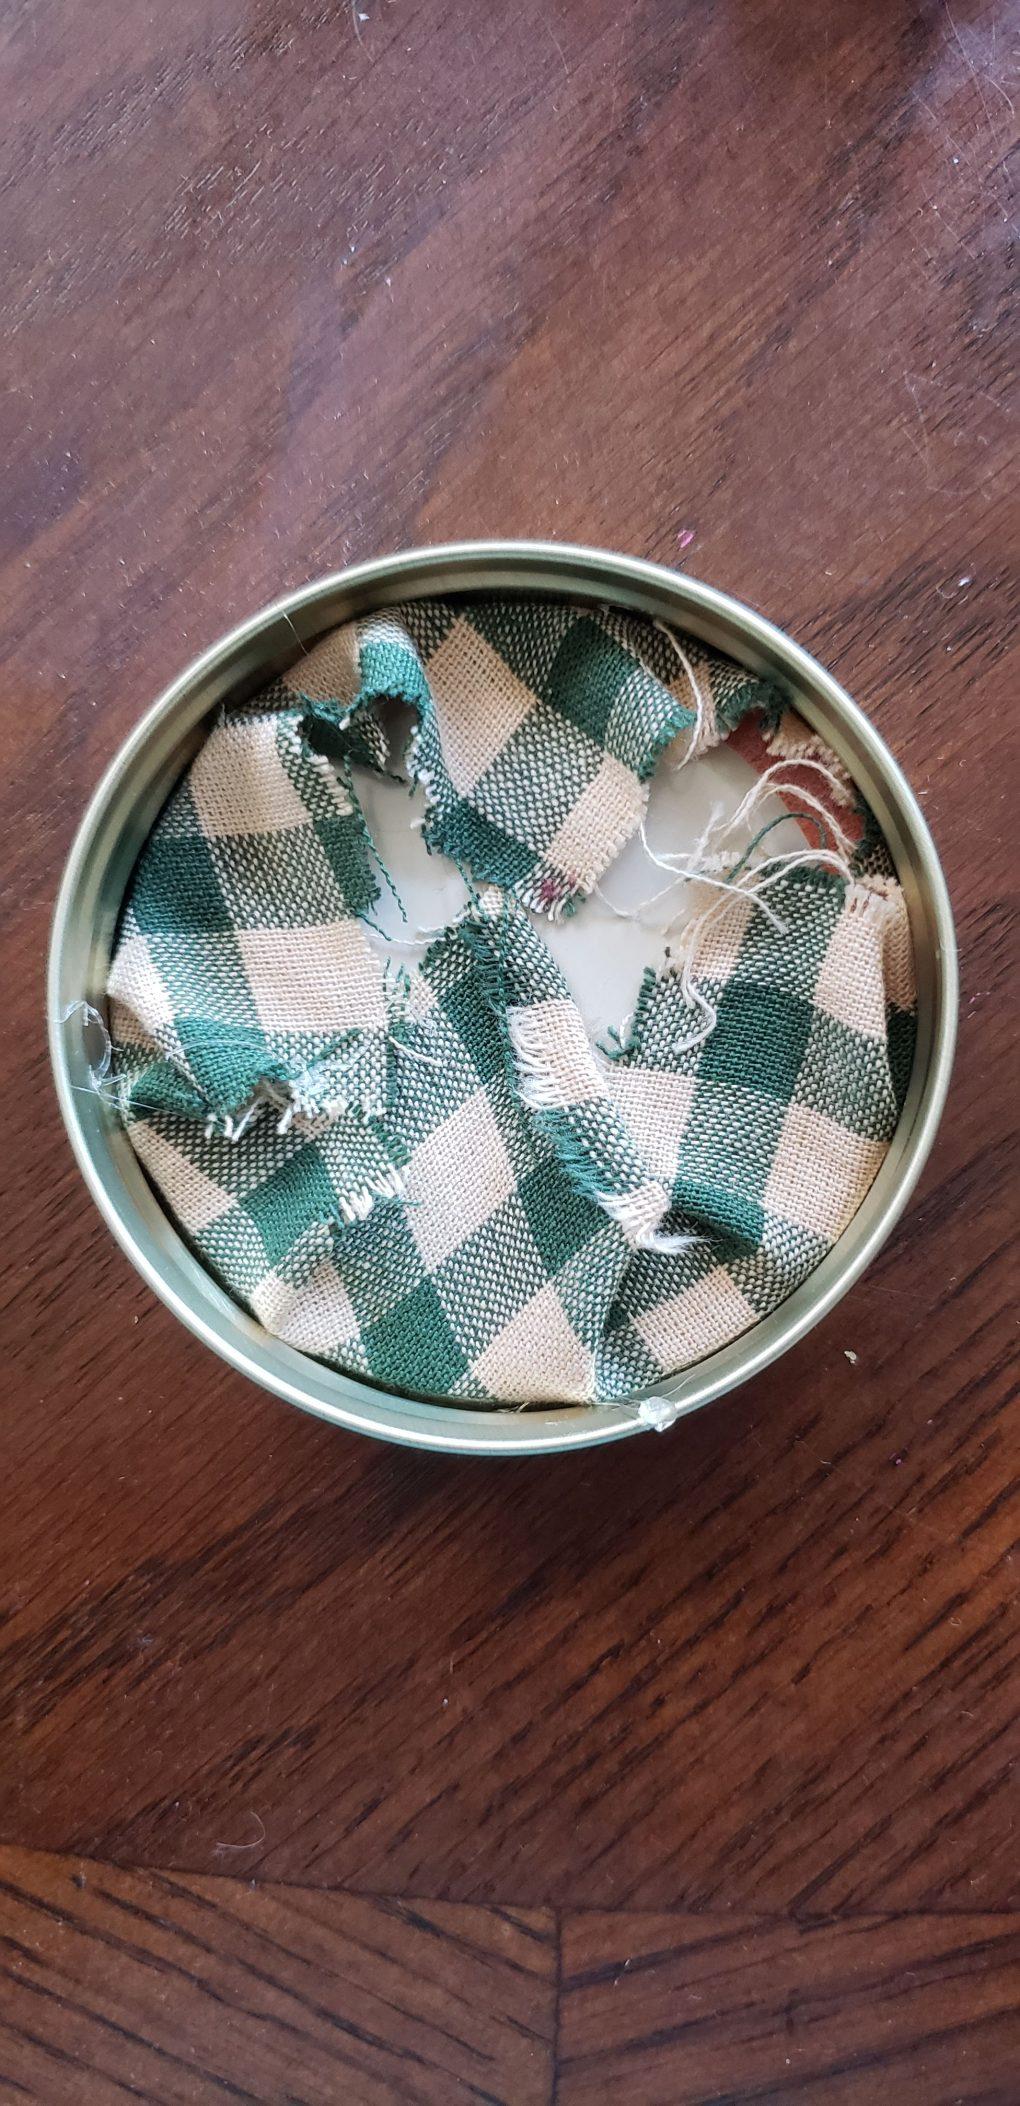 step2 - fold the fabric over the mason jar lid and glue